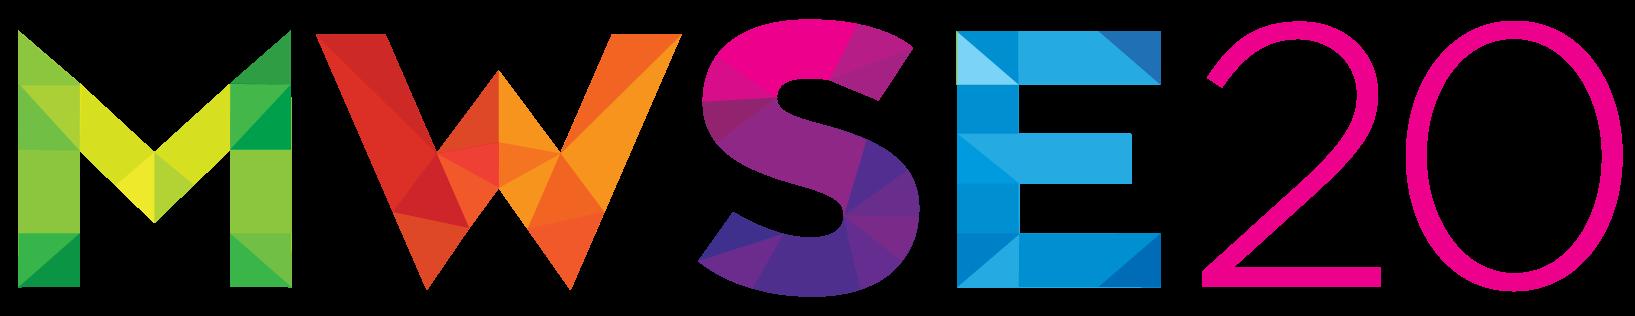 MWSE 2020 Logo